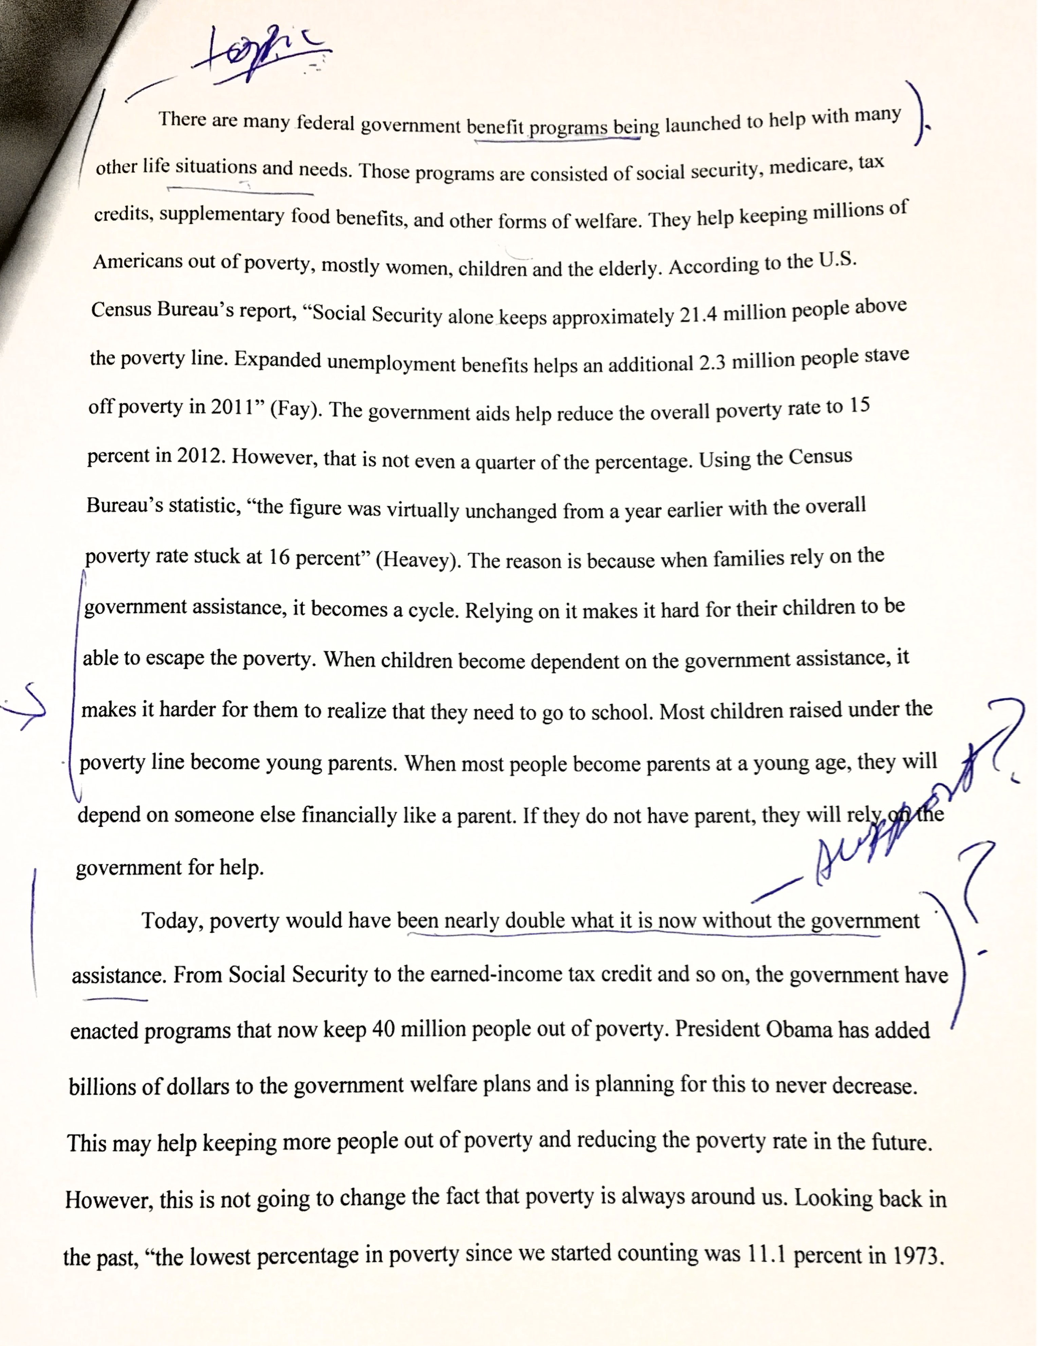 002 Rewrite Essay Best Software Article Freelance Full